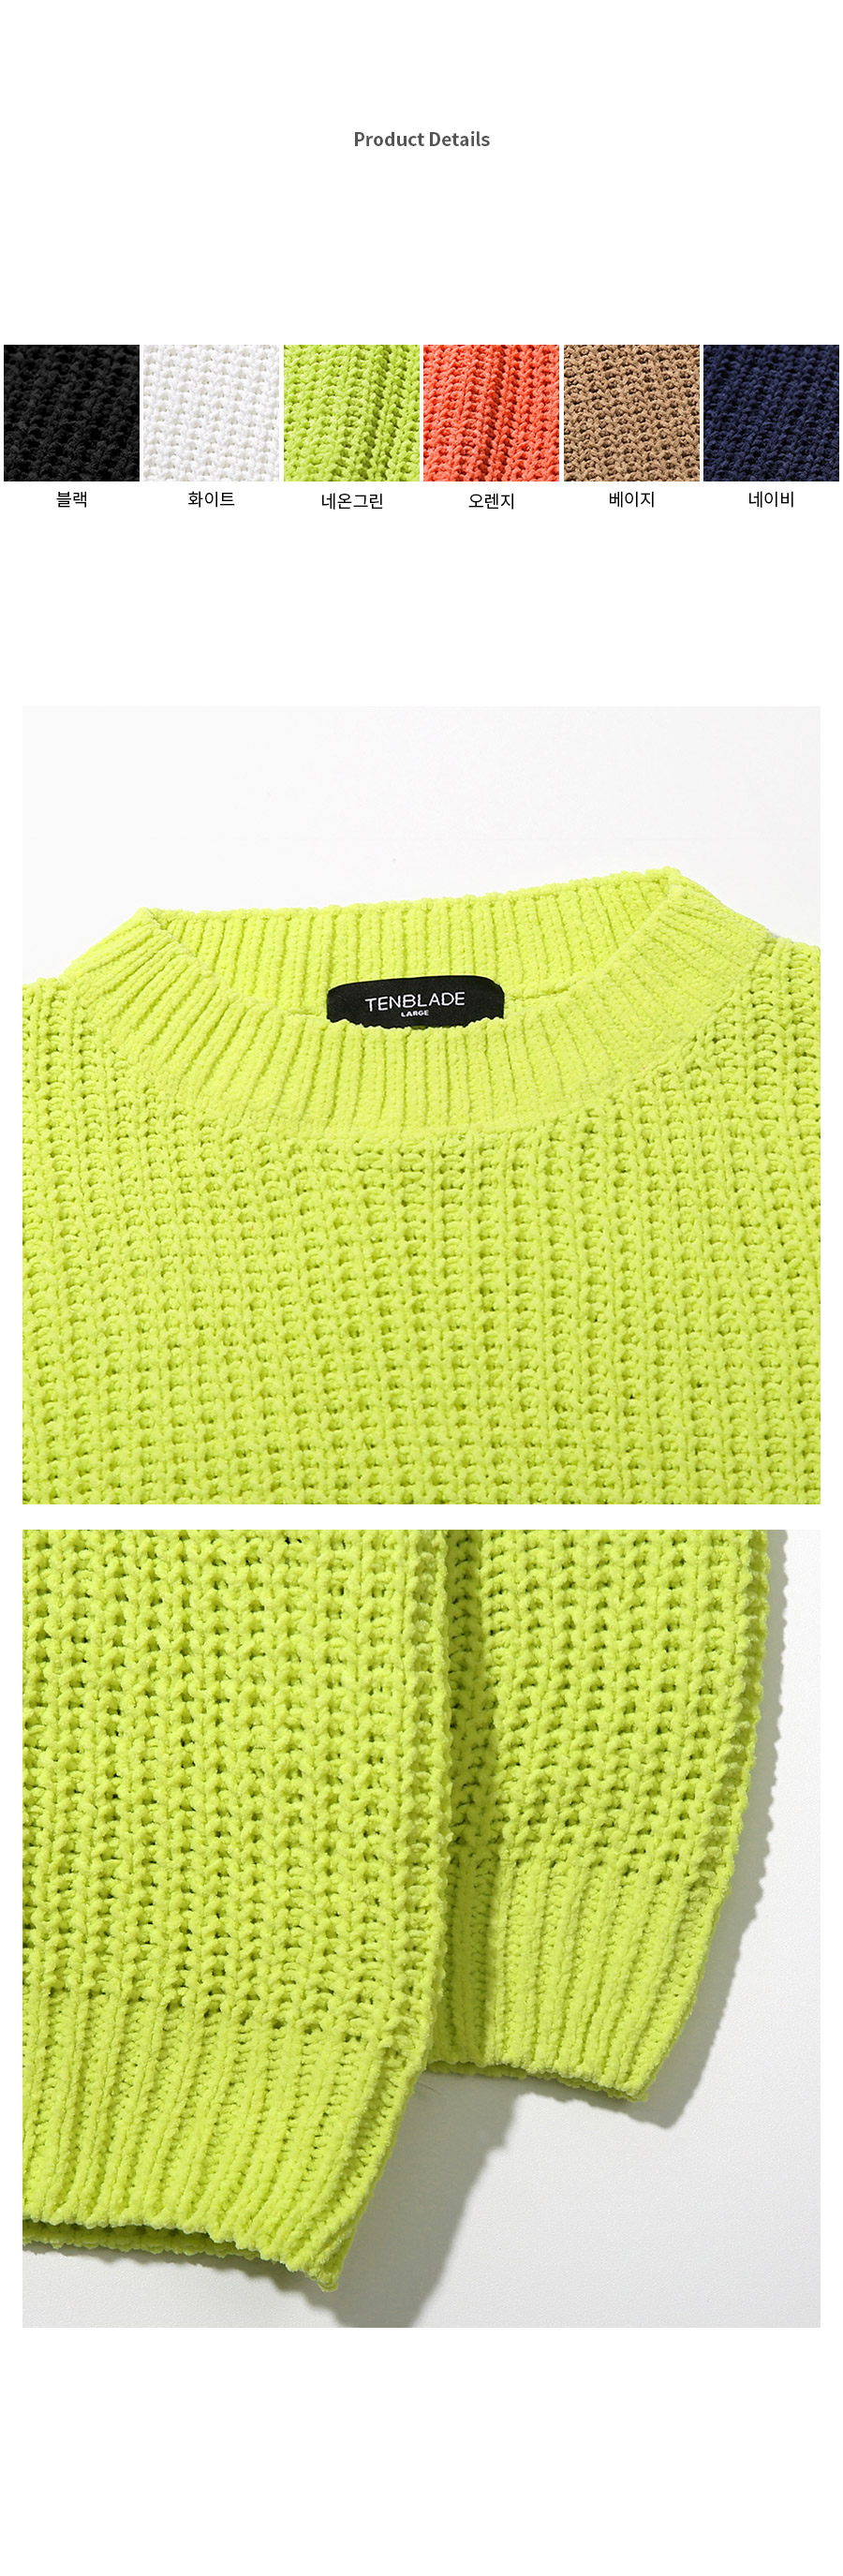 tai551kt-neon-green-07.jpg